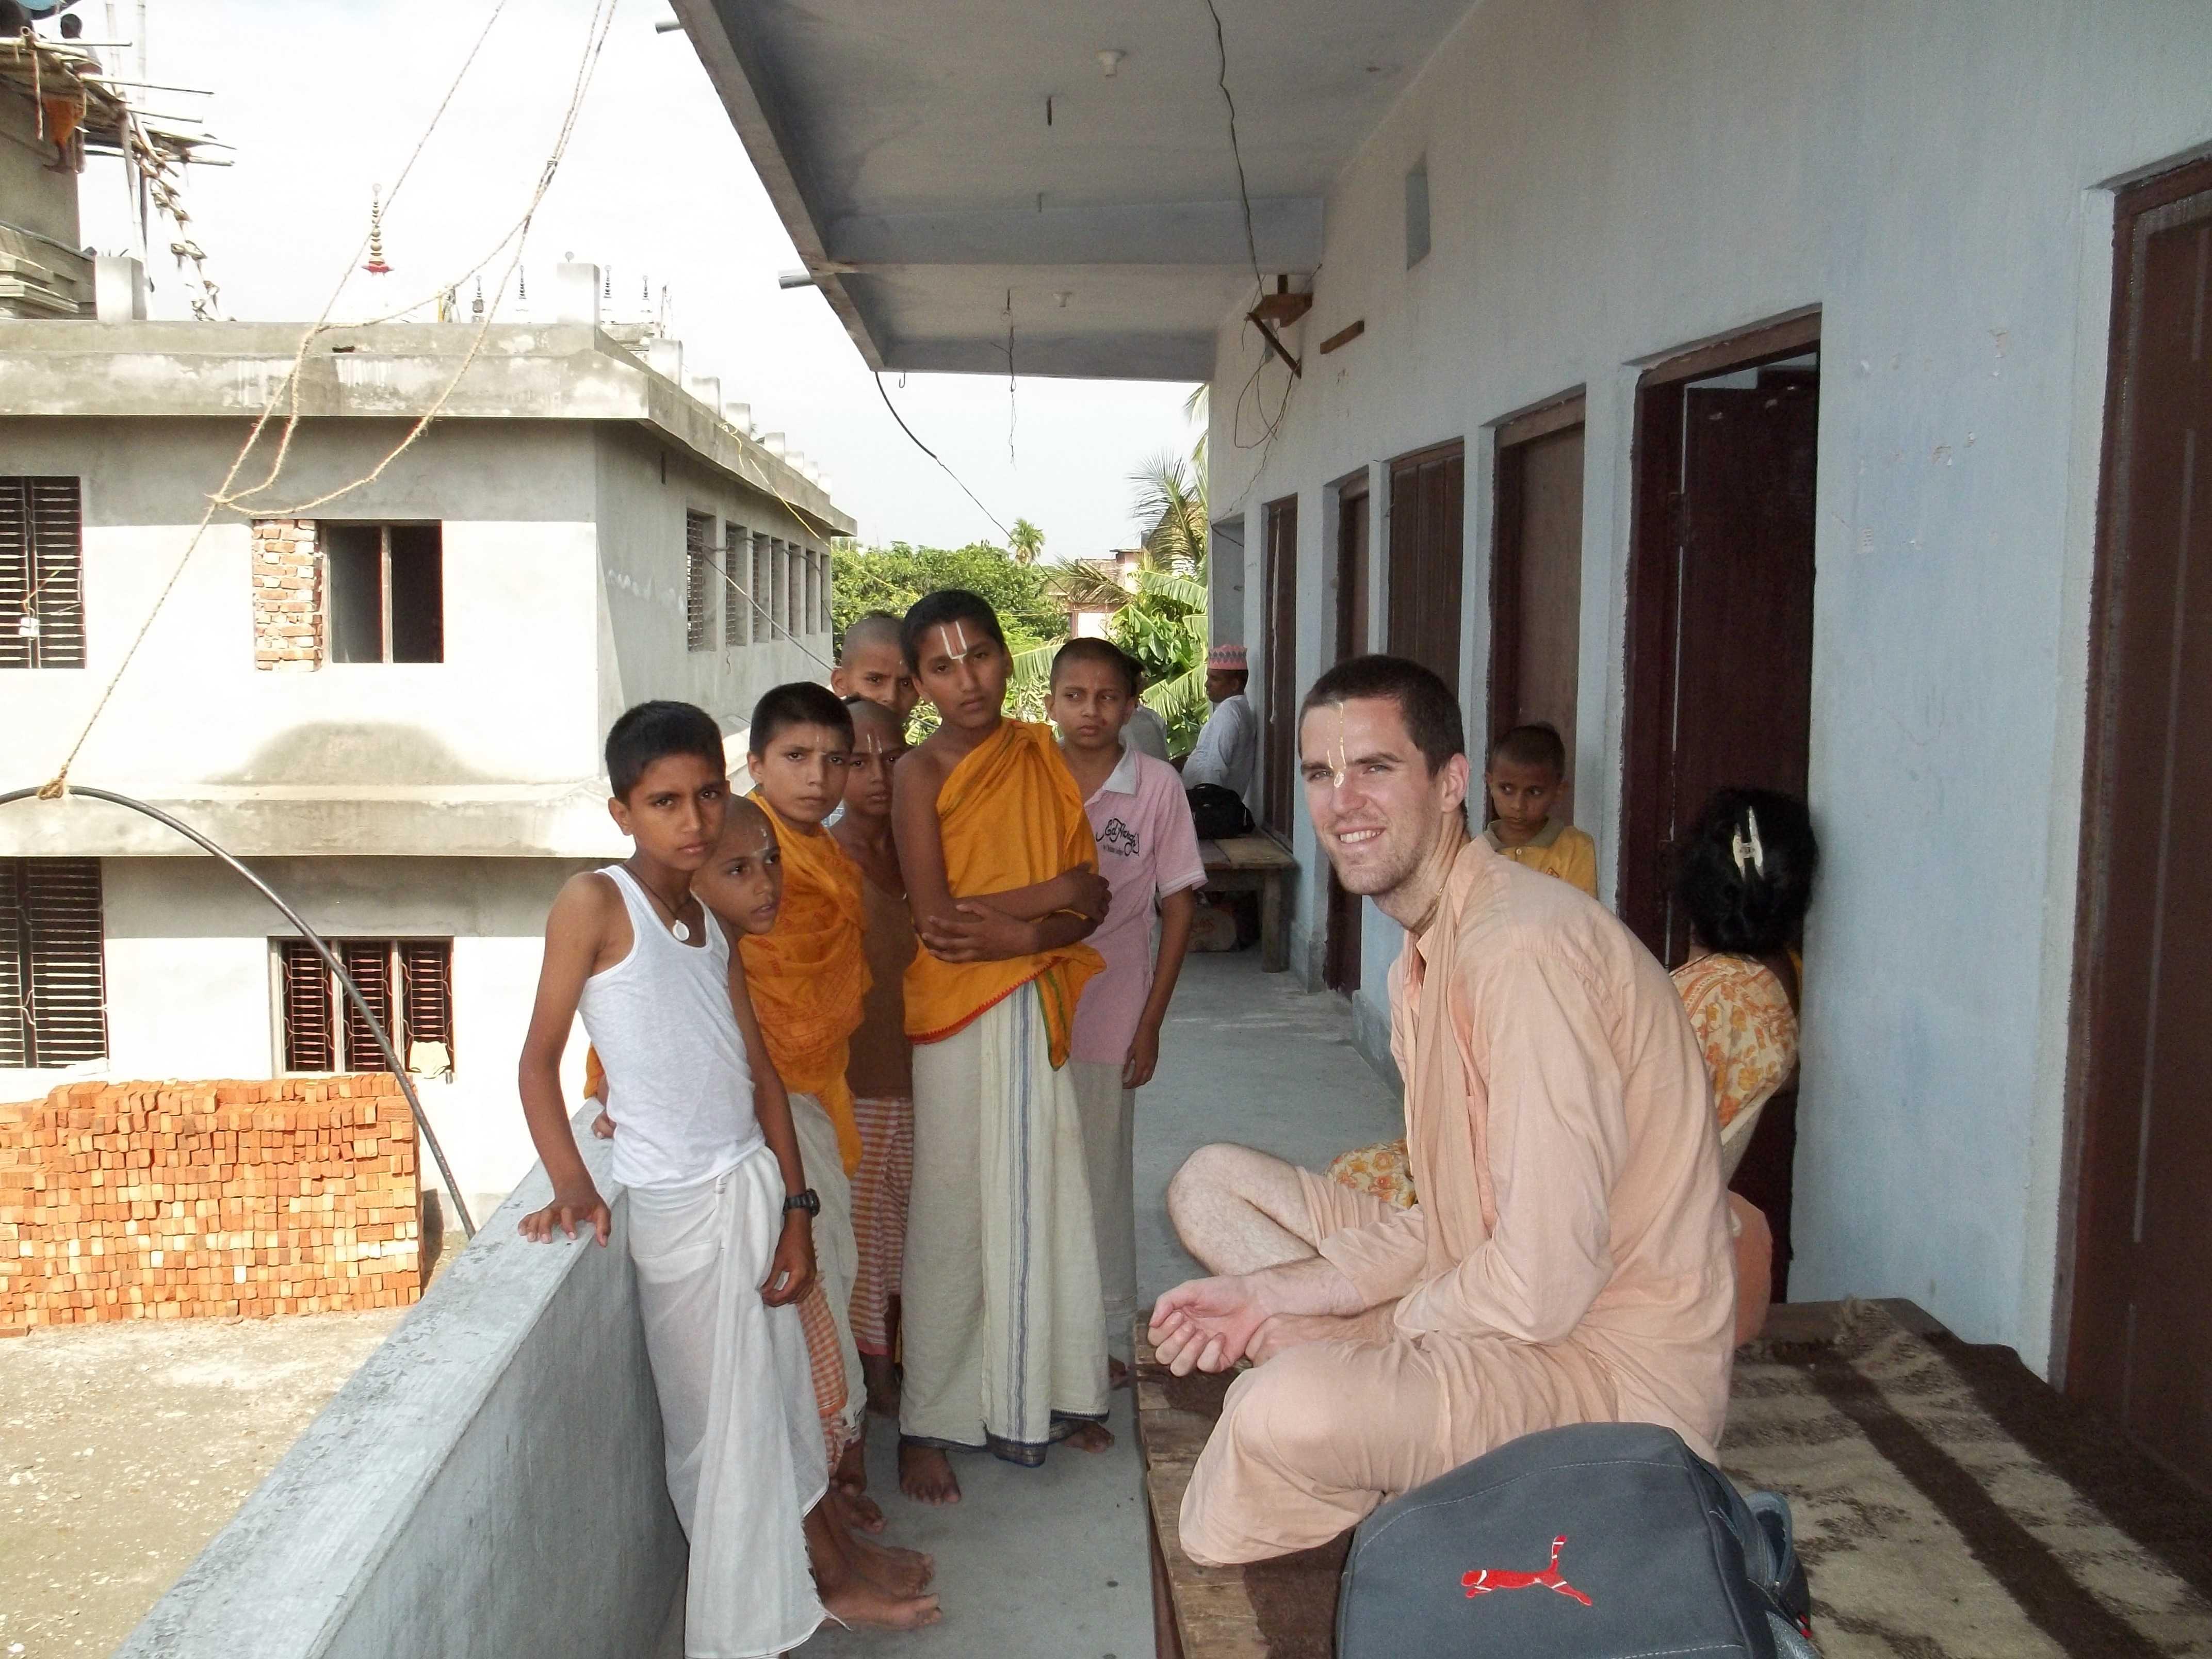 <h3> Tyagi Maharaja with Gurukul students in Laxmi Narayan temple at Birat Nagar, Nepal</h3>